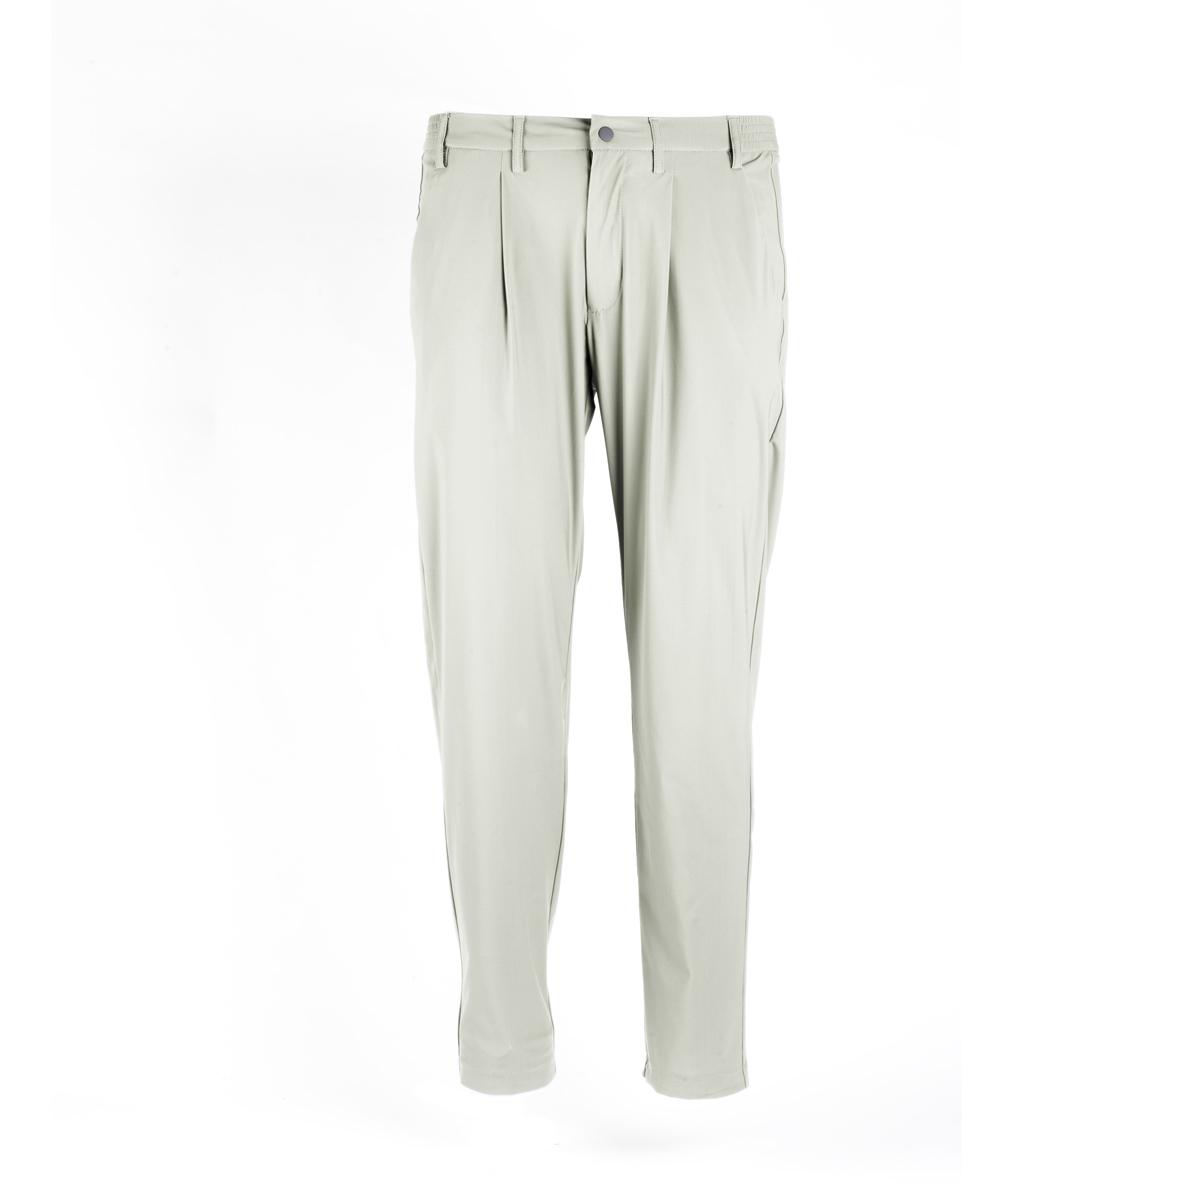 Pantaloni People Of Shibuya Ghiaccio